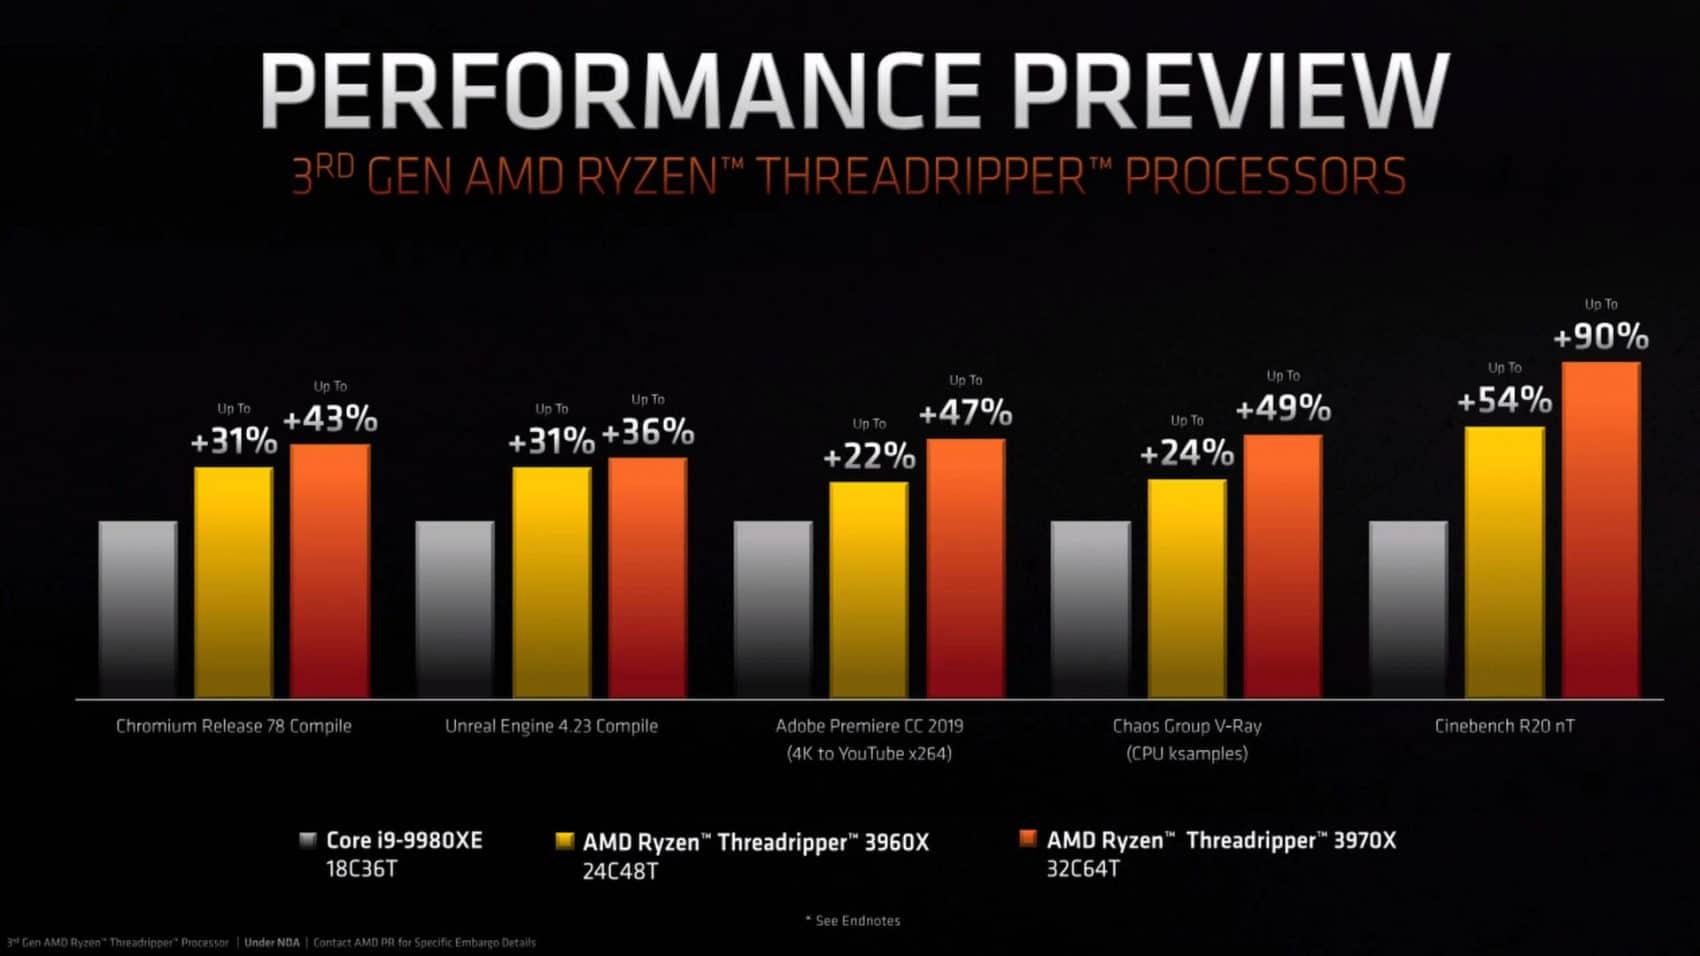 Annonce des processeurs AMD Ryzen Threadripper par AMD performances